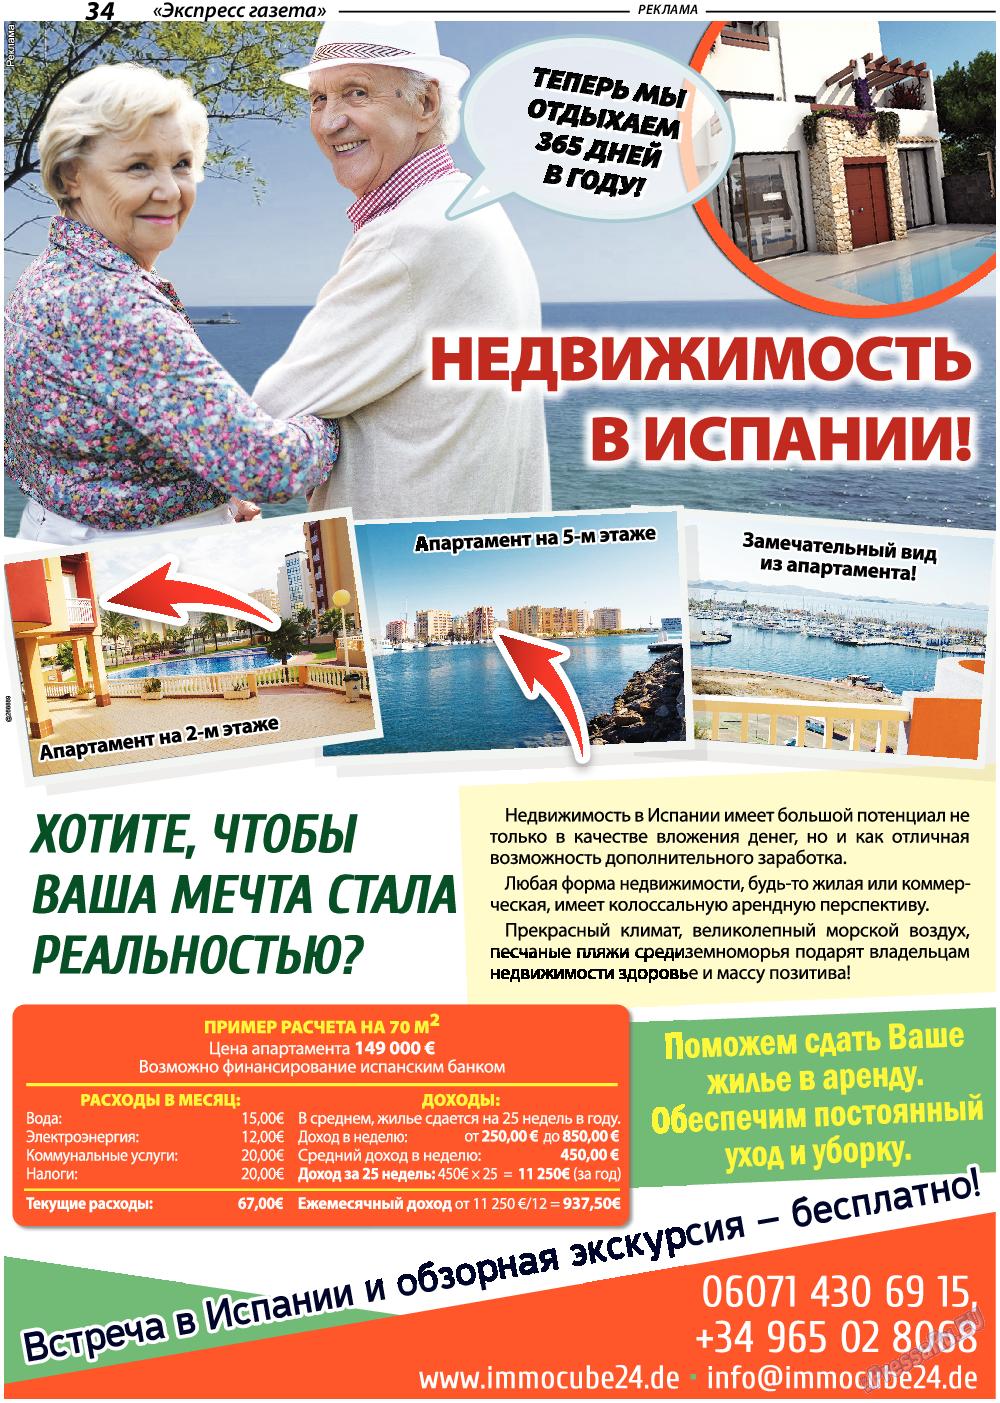 Экспресс газета (газета). 2019 год, номер 1, стр. 34